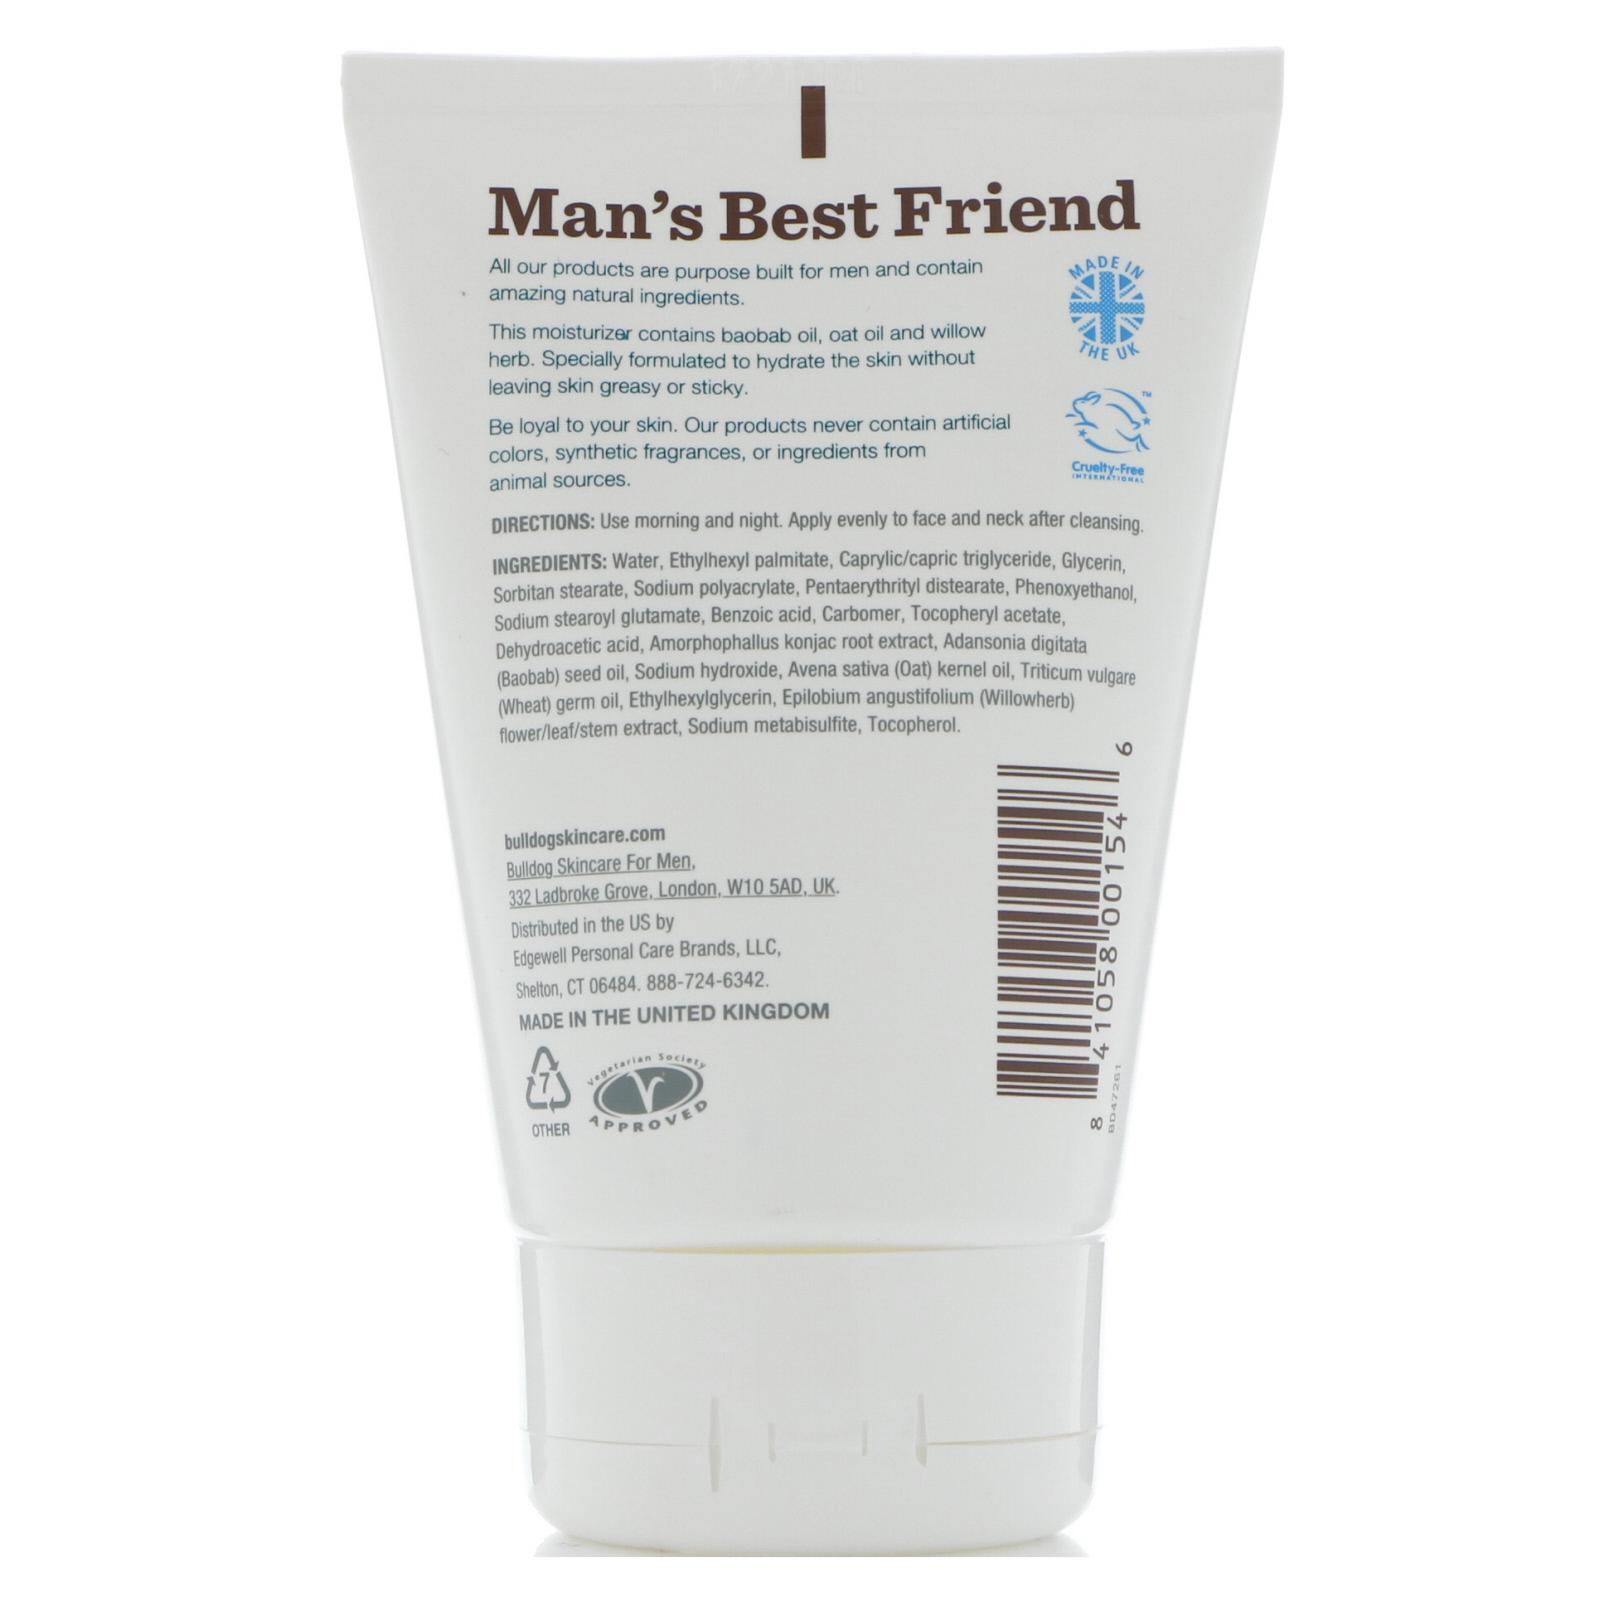 Age Defense Facial Moisturizer - 3.3 fl. oz. by Bulldog Natural Skincare (pack of 6) ChapStick Lip Moisturizer SPF 12, 0.15 oz